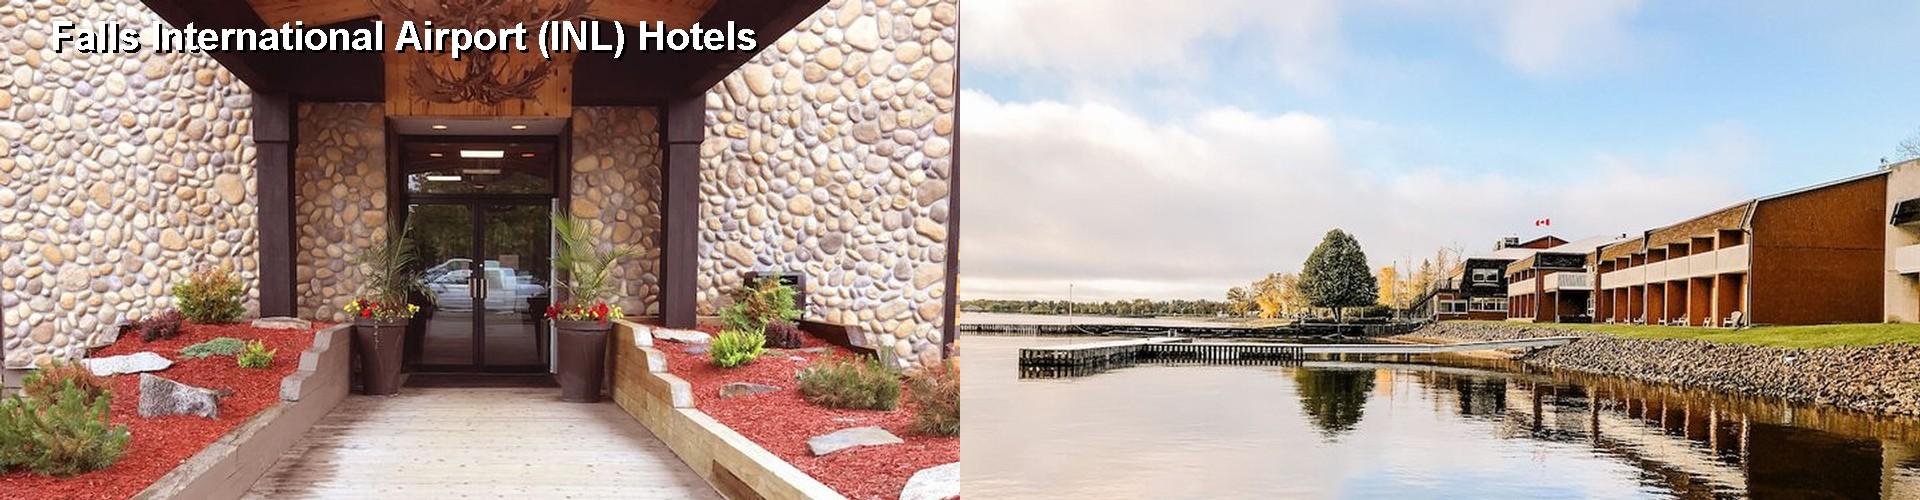 Americas Best Value Inn And Suites International Falls Hotels Near Falls International Airport Inl In International